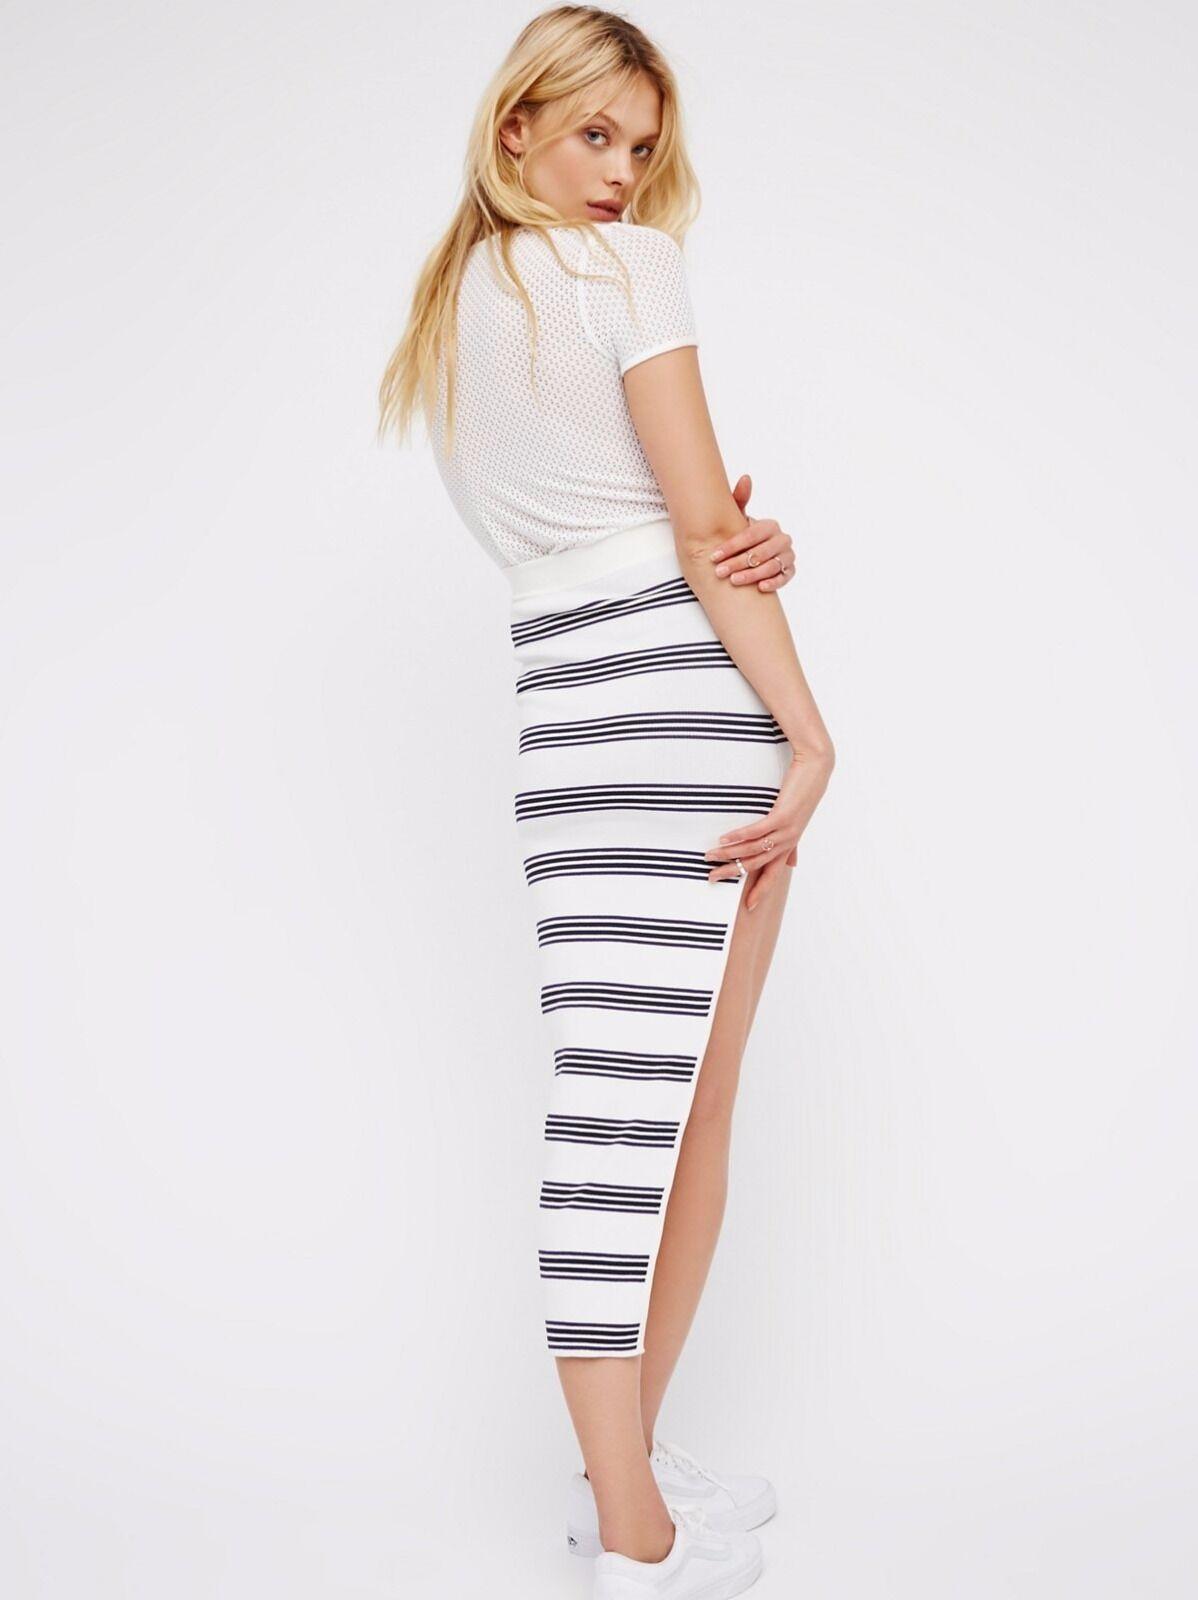 New Free People Alice McCall My Selfish Heart Stripe Skirt Size 4 US  240